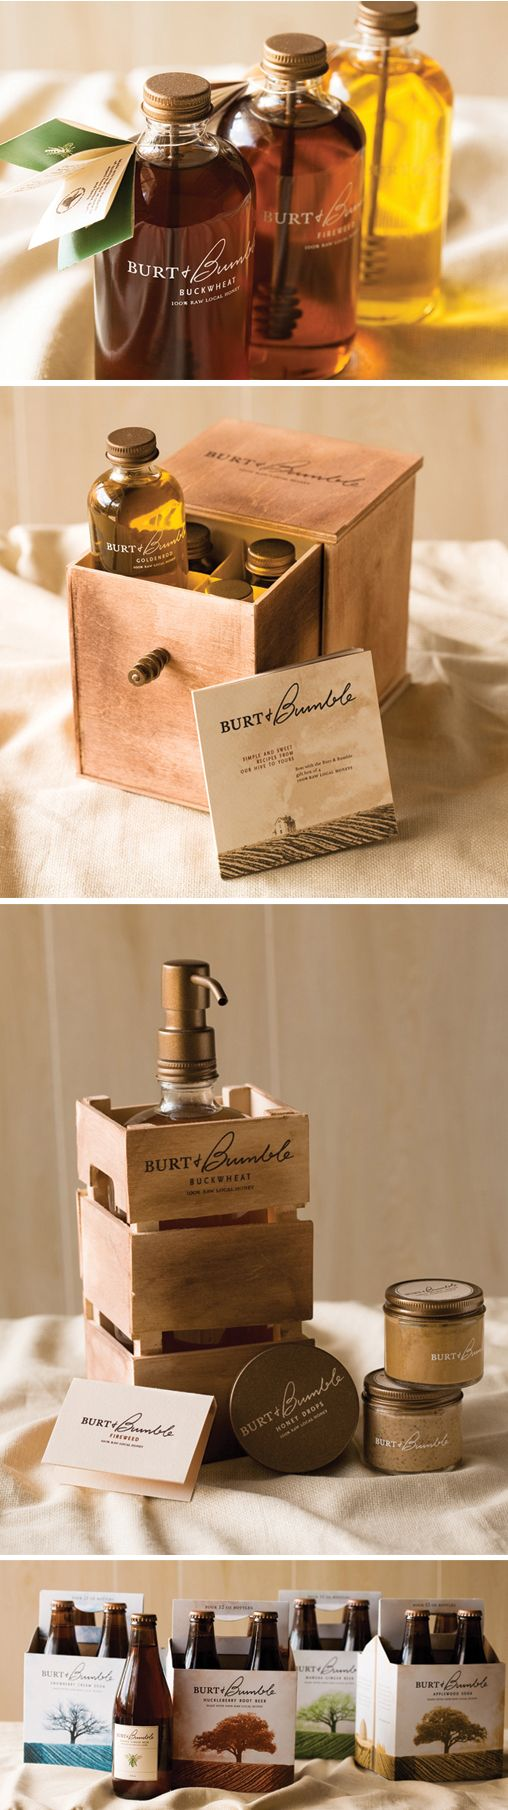 burt + bumble honey products design #packaging #design PD